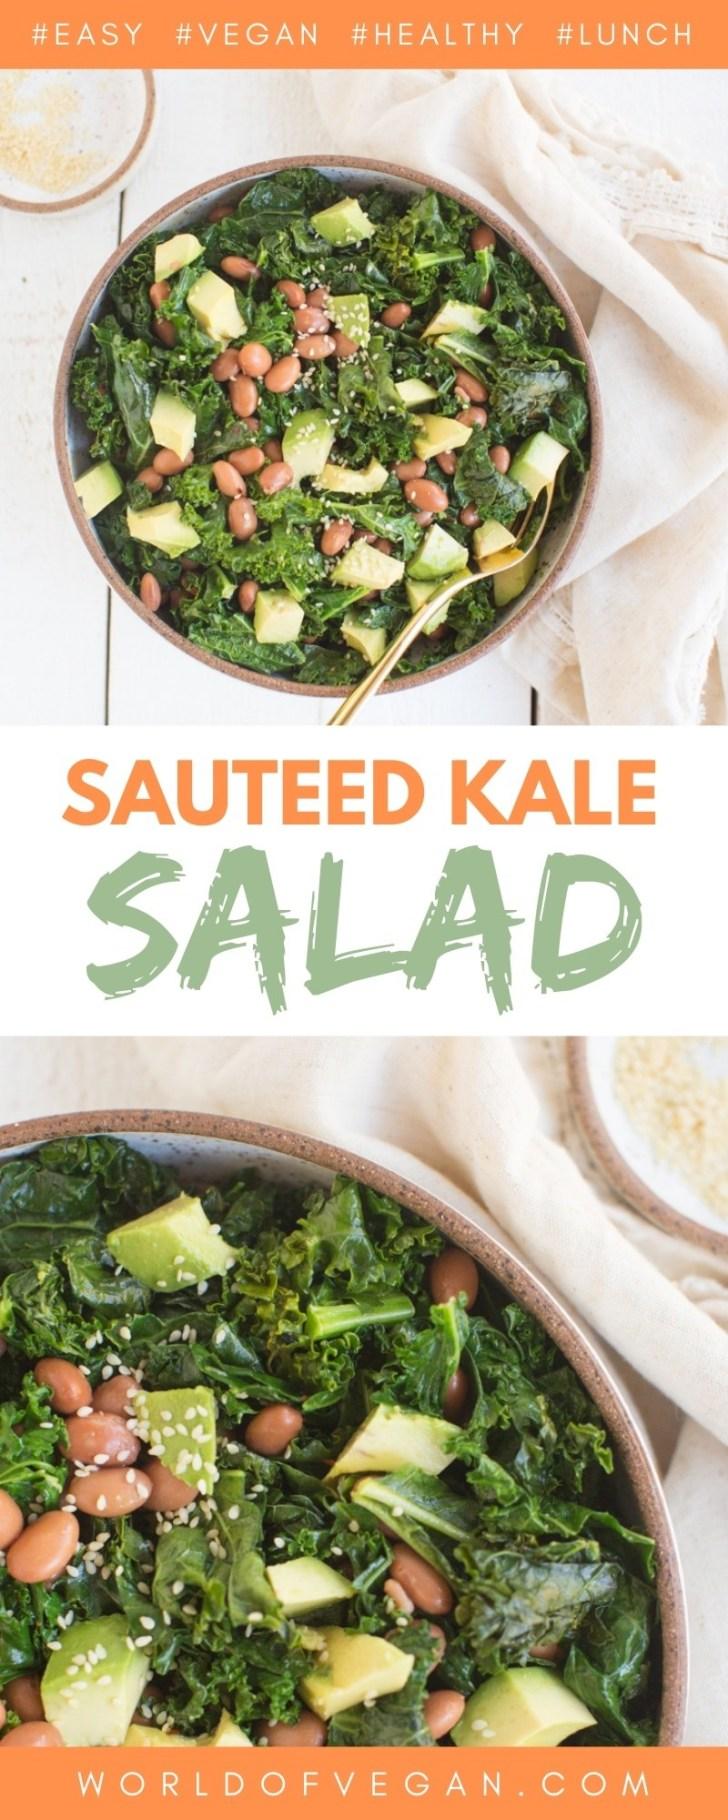 Sauteed Kale and Avocado Salad